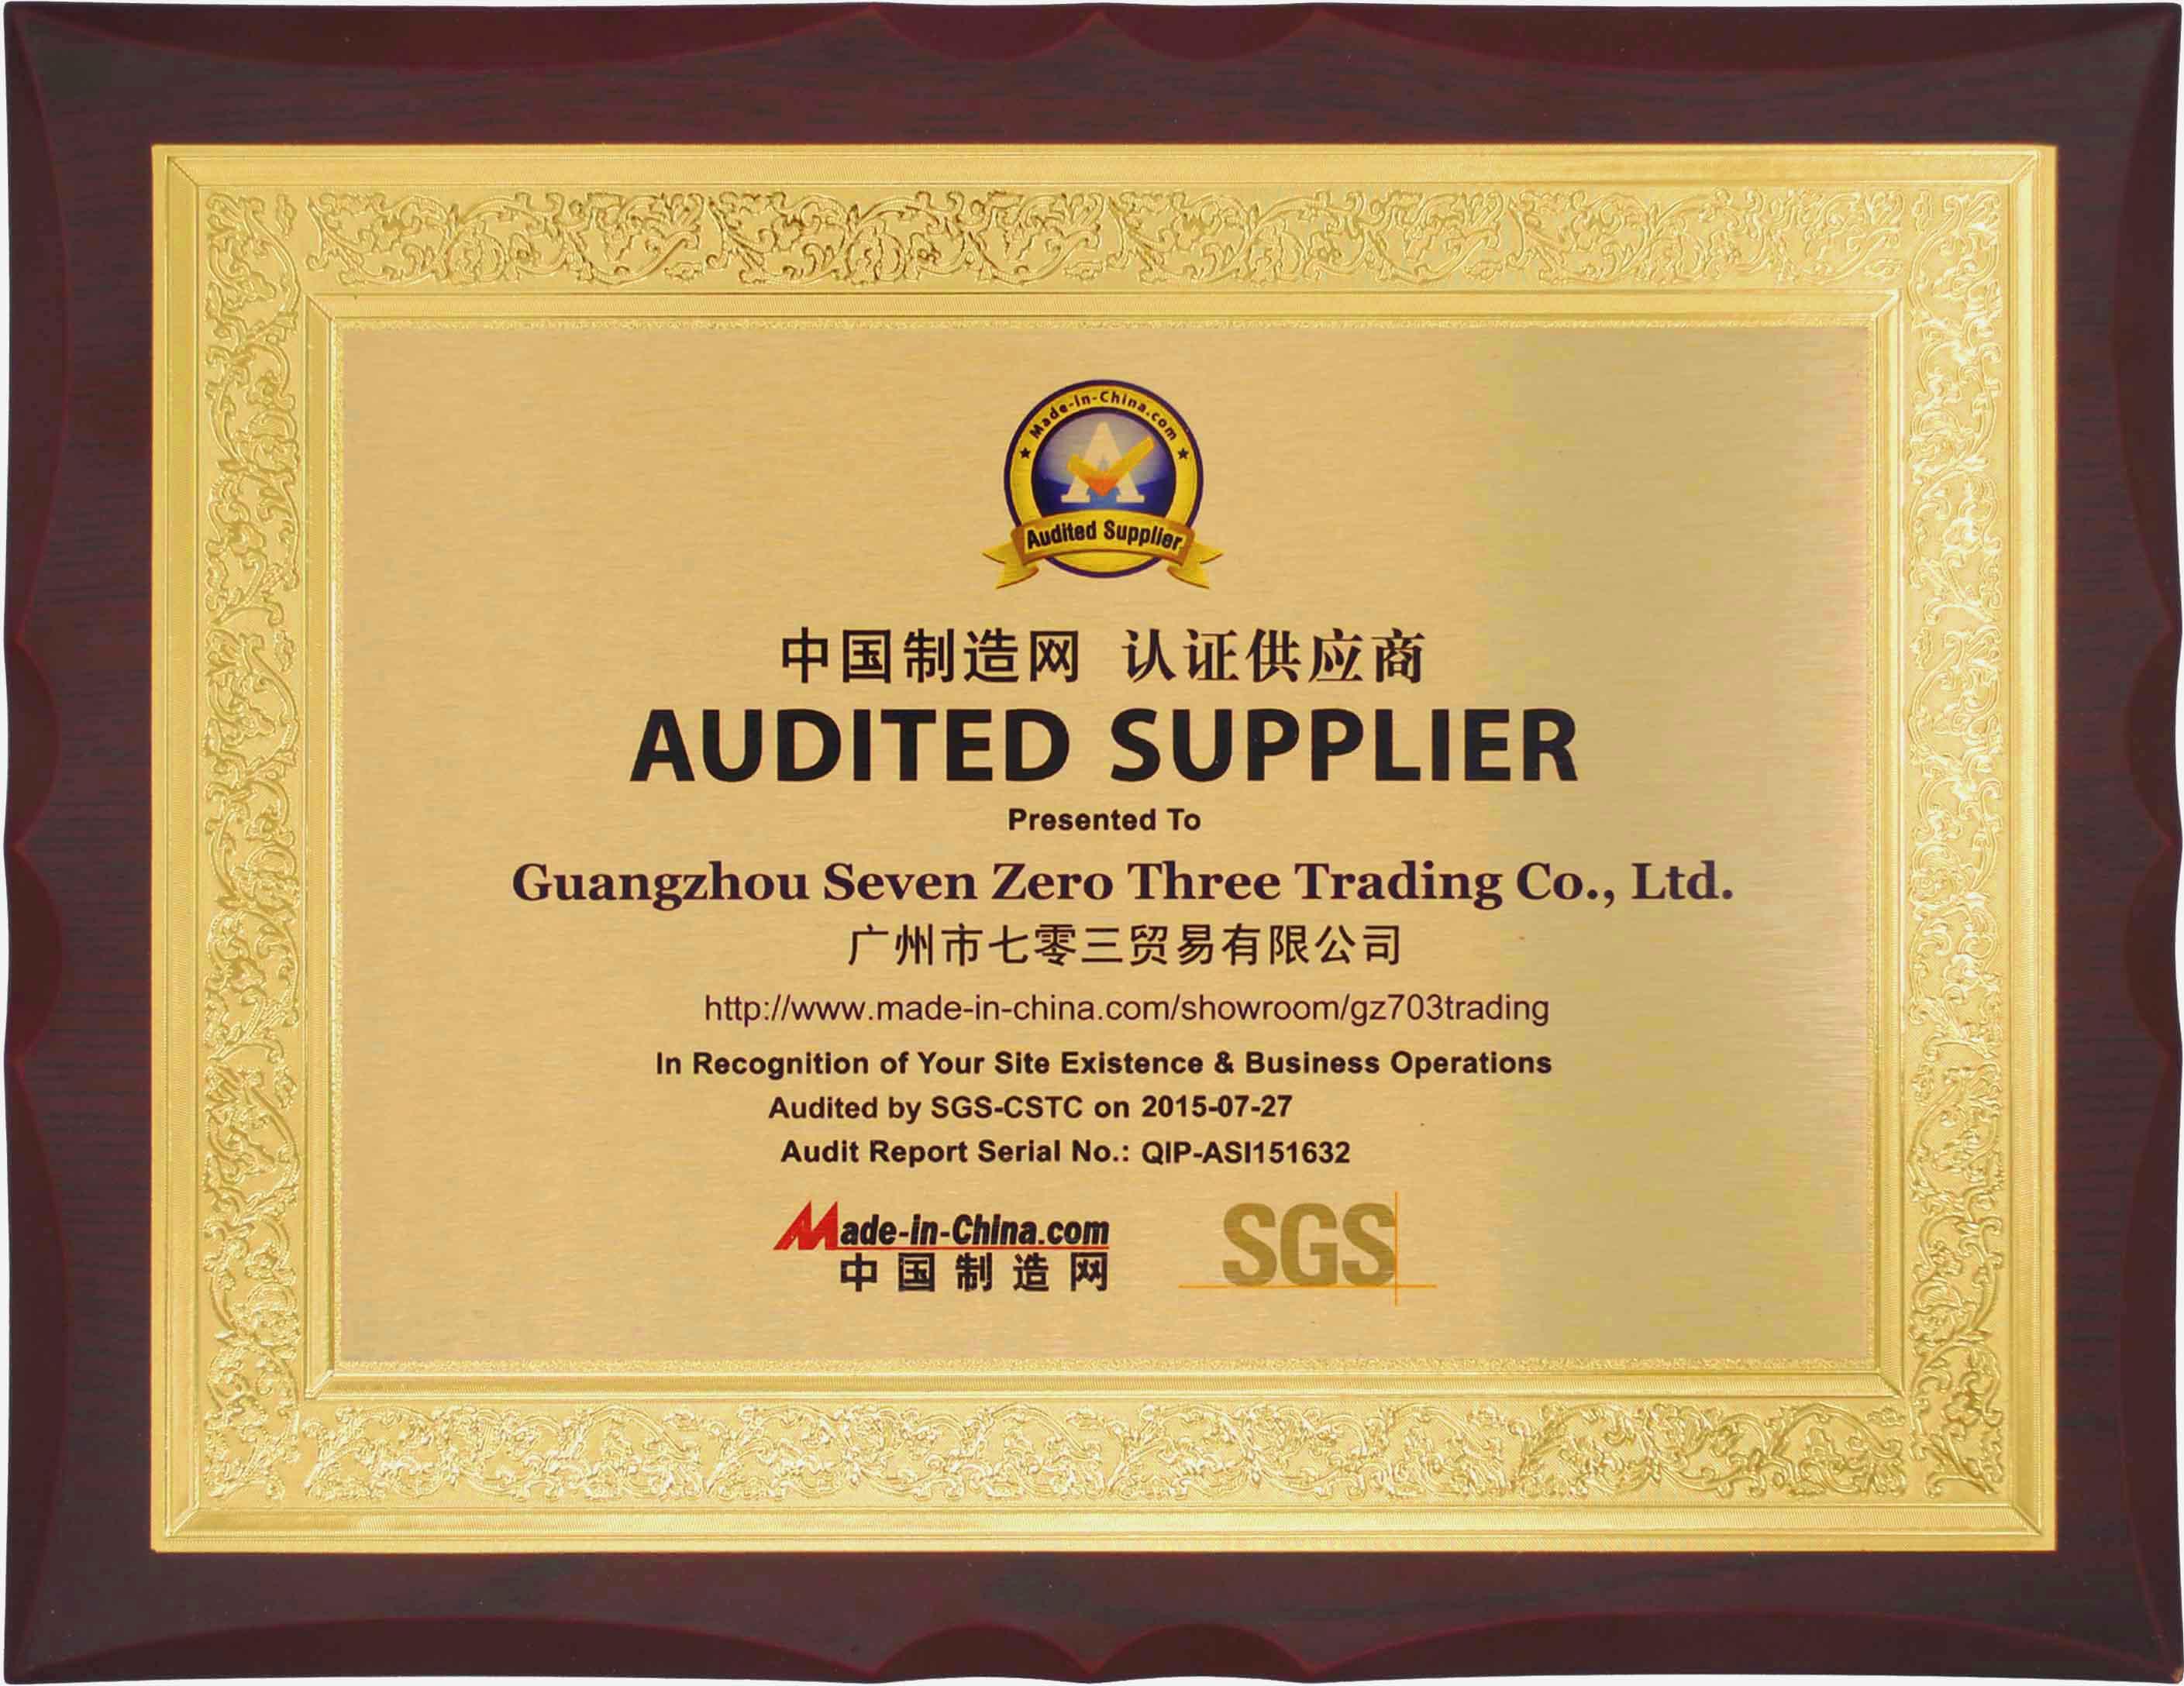 SGS Certified supplier